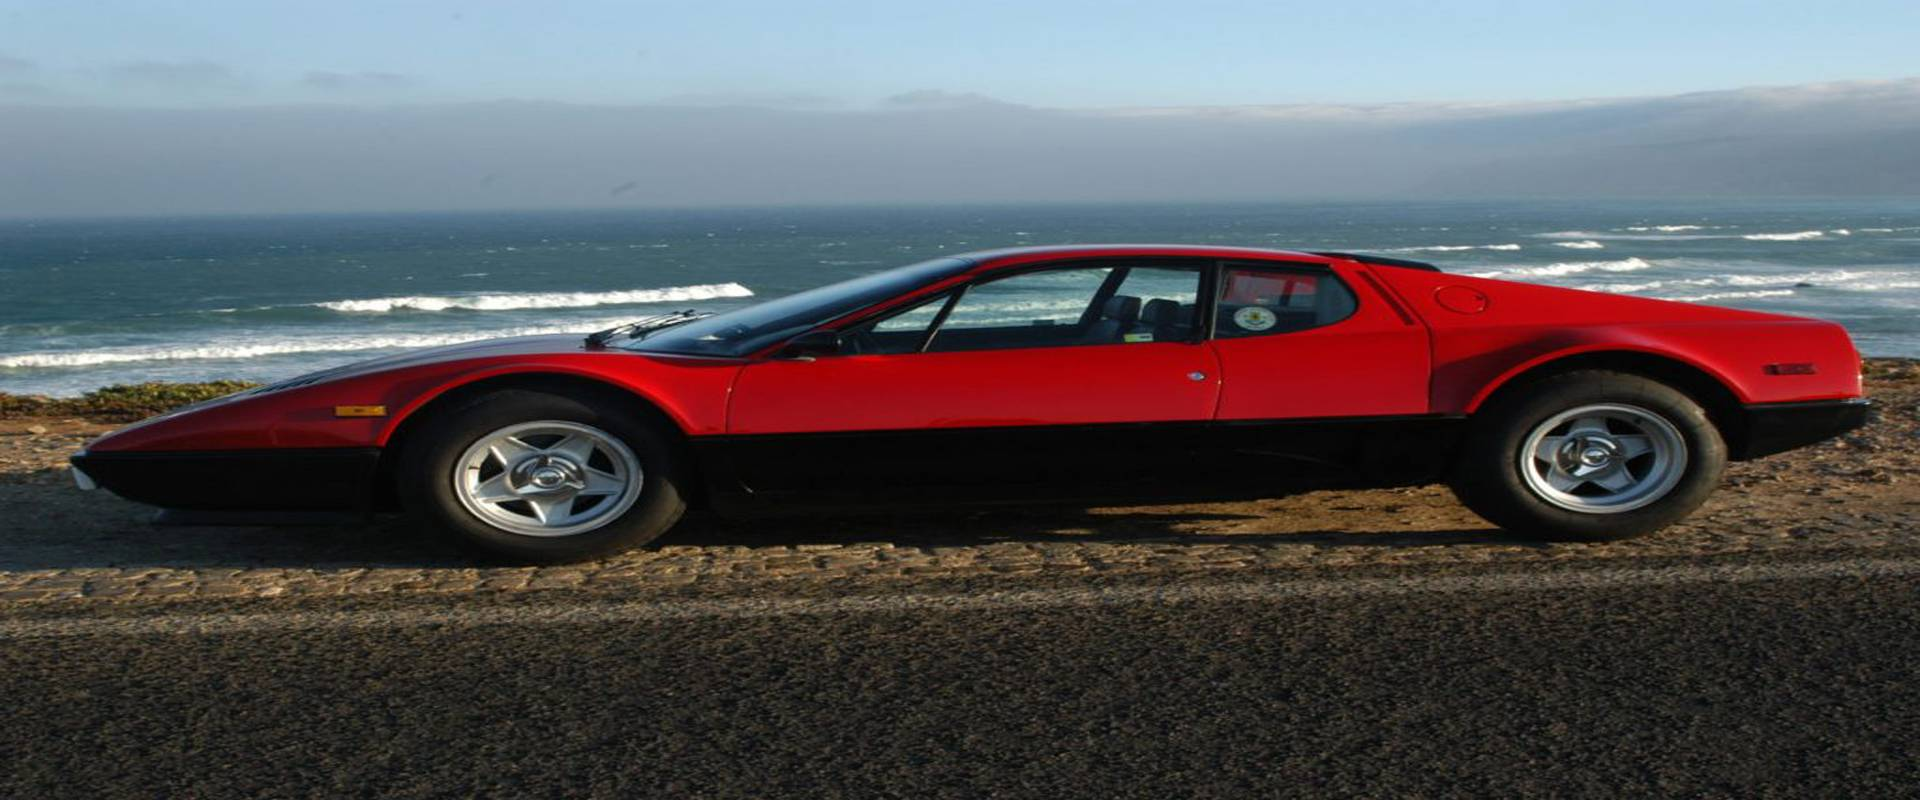 My Pair of Ferrari Boxers 365BB & 512BB